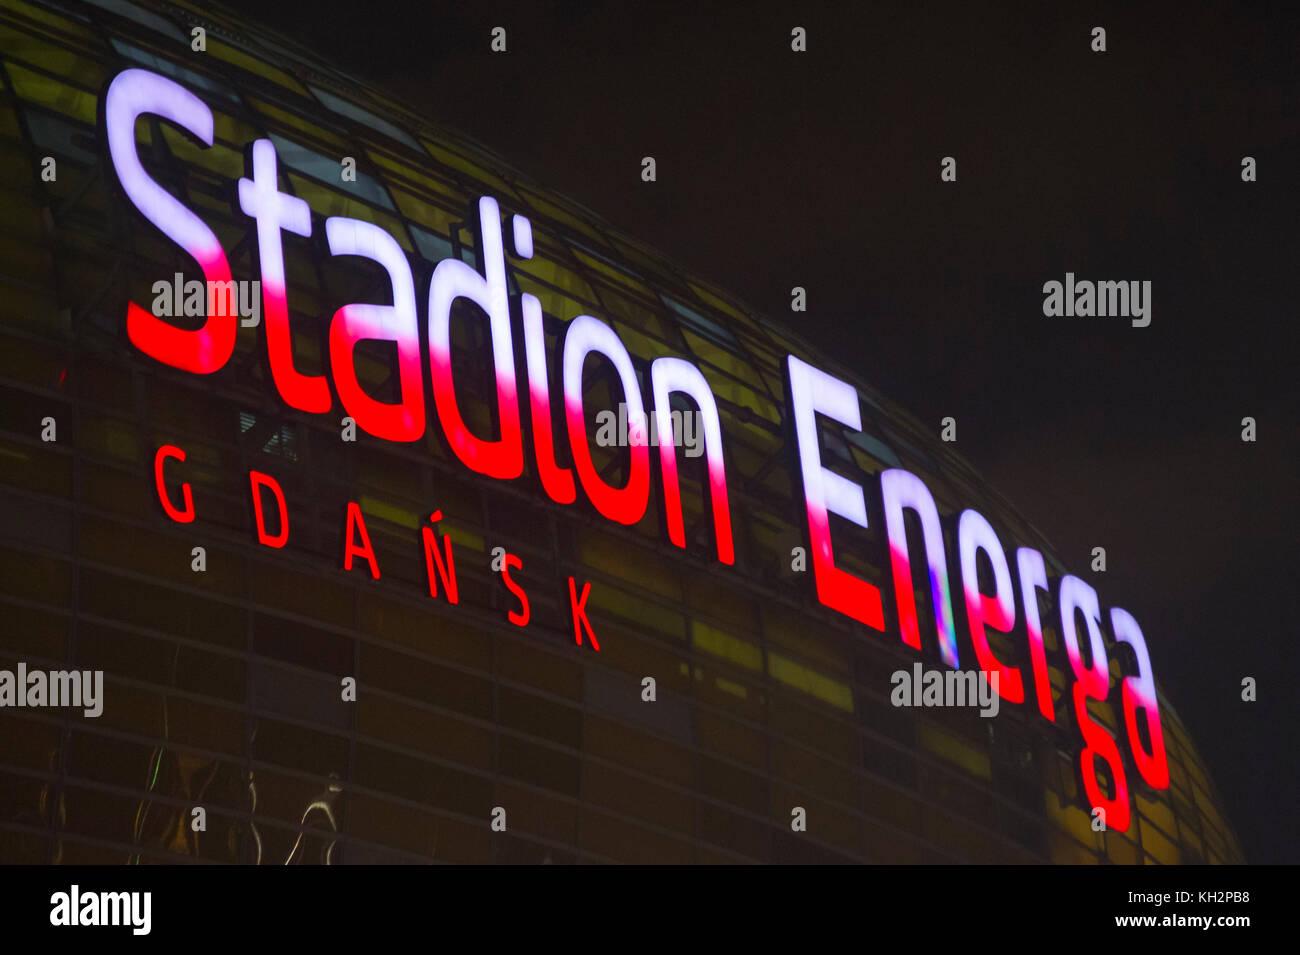 Stadion Energa Gdansk in Gdansk, Poland. 12th Nov, 2017. Credit: Wojciech Strozyk/Alamy Live News - Stock Image